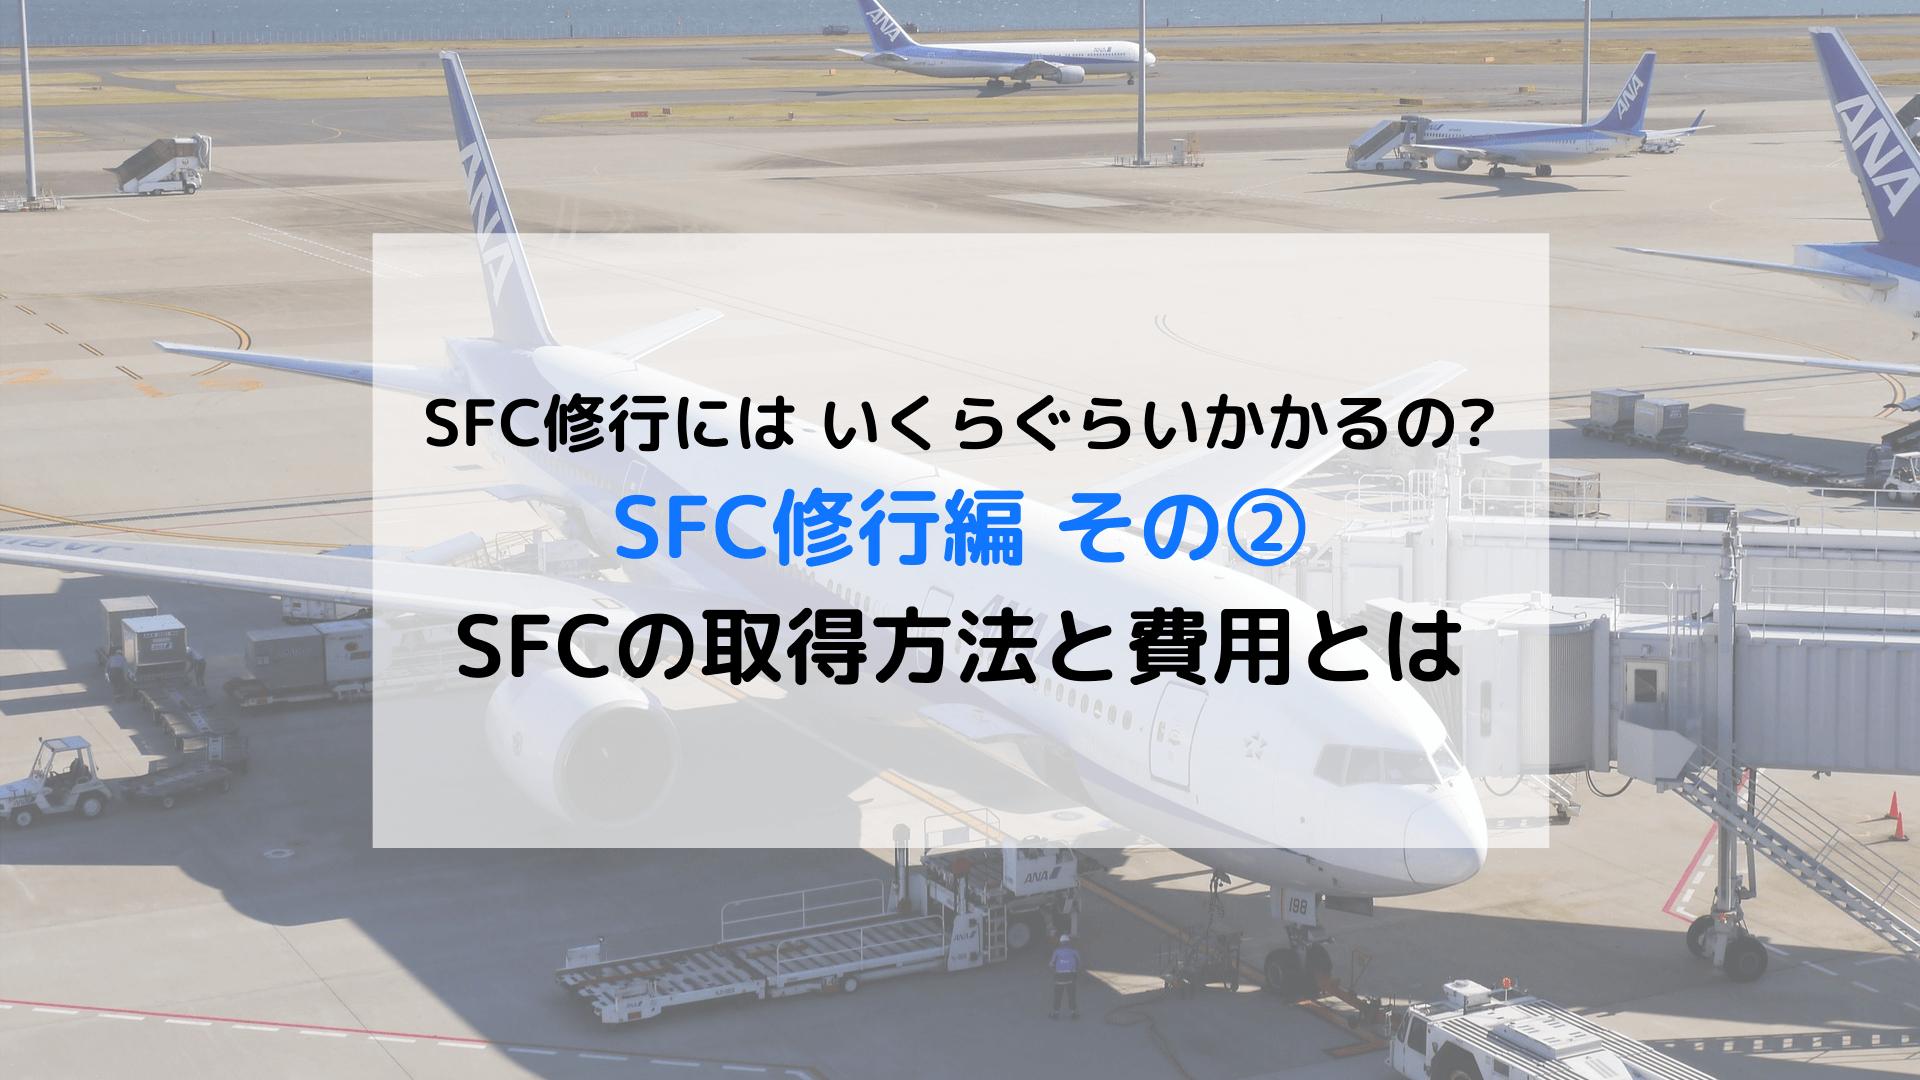 SFC修行 SFCの取得方法と費用とは